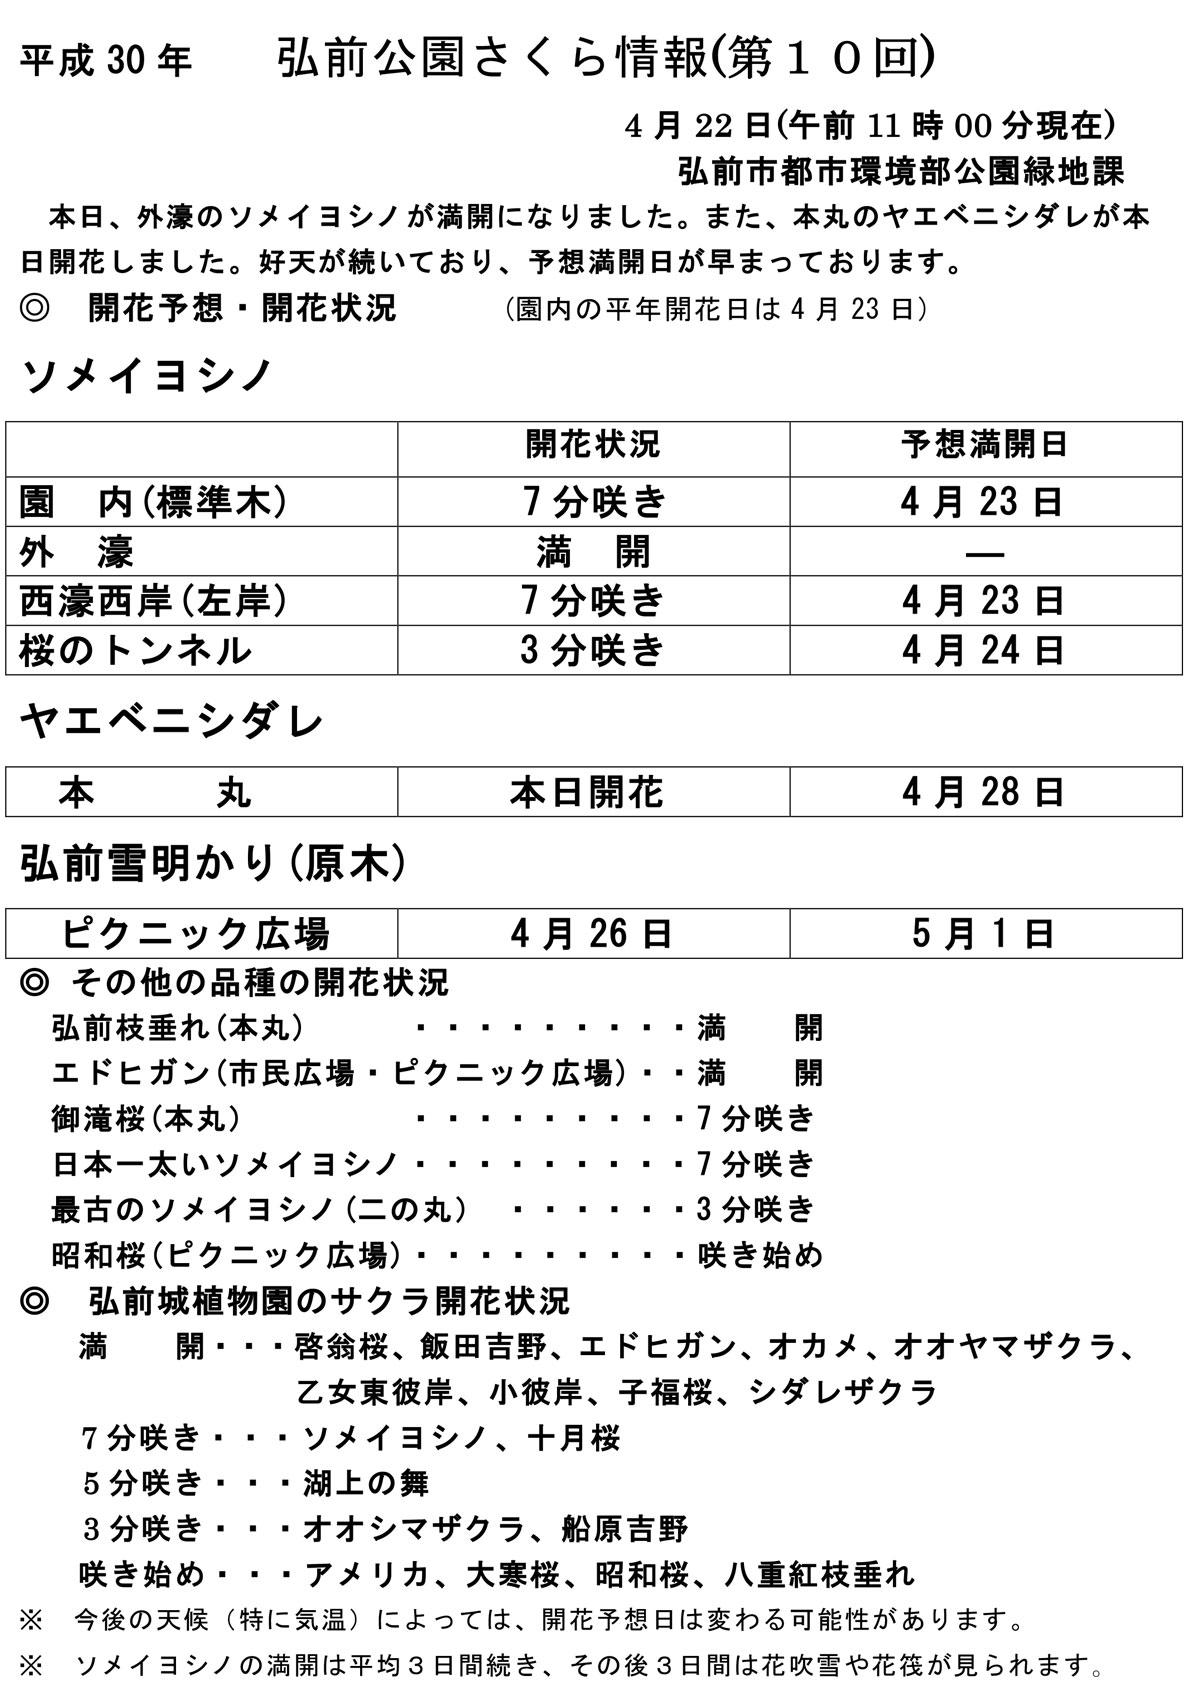 2018年4月22日付 弘前公園さくら情報(第10回)【弘前公園・弘前城】